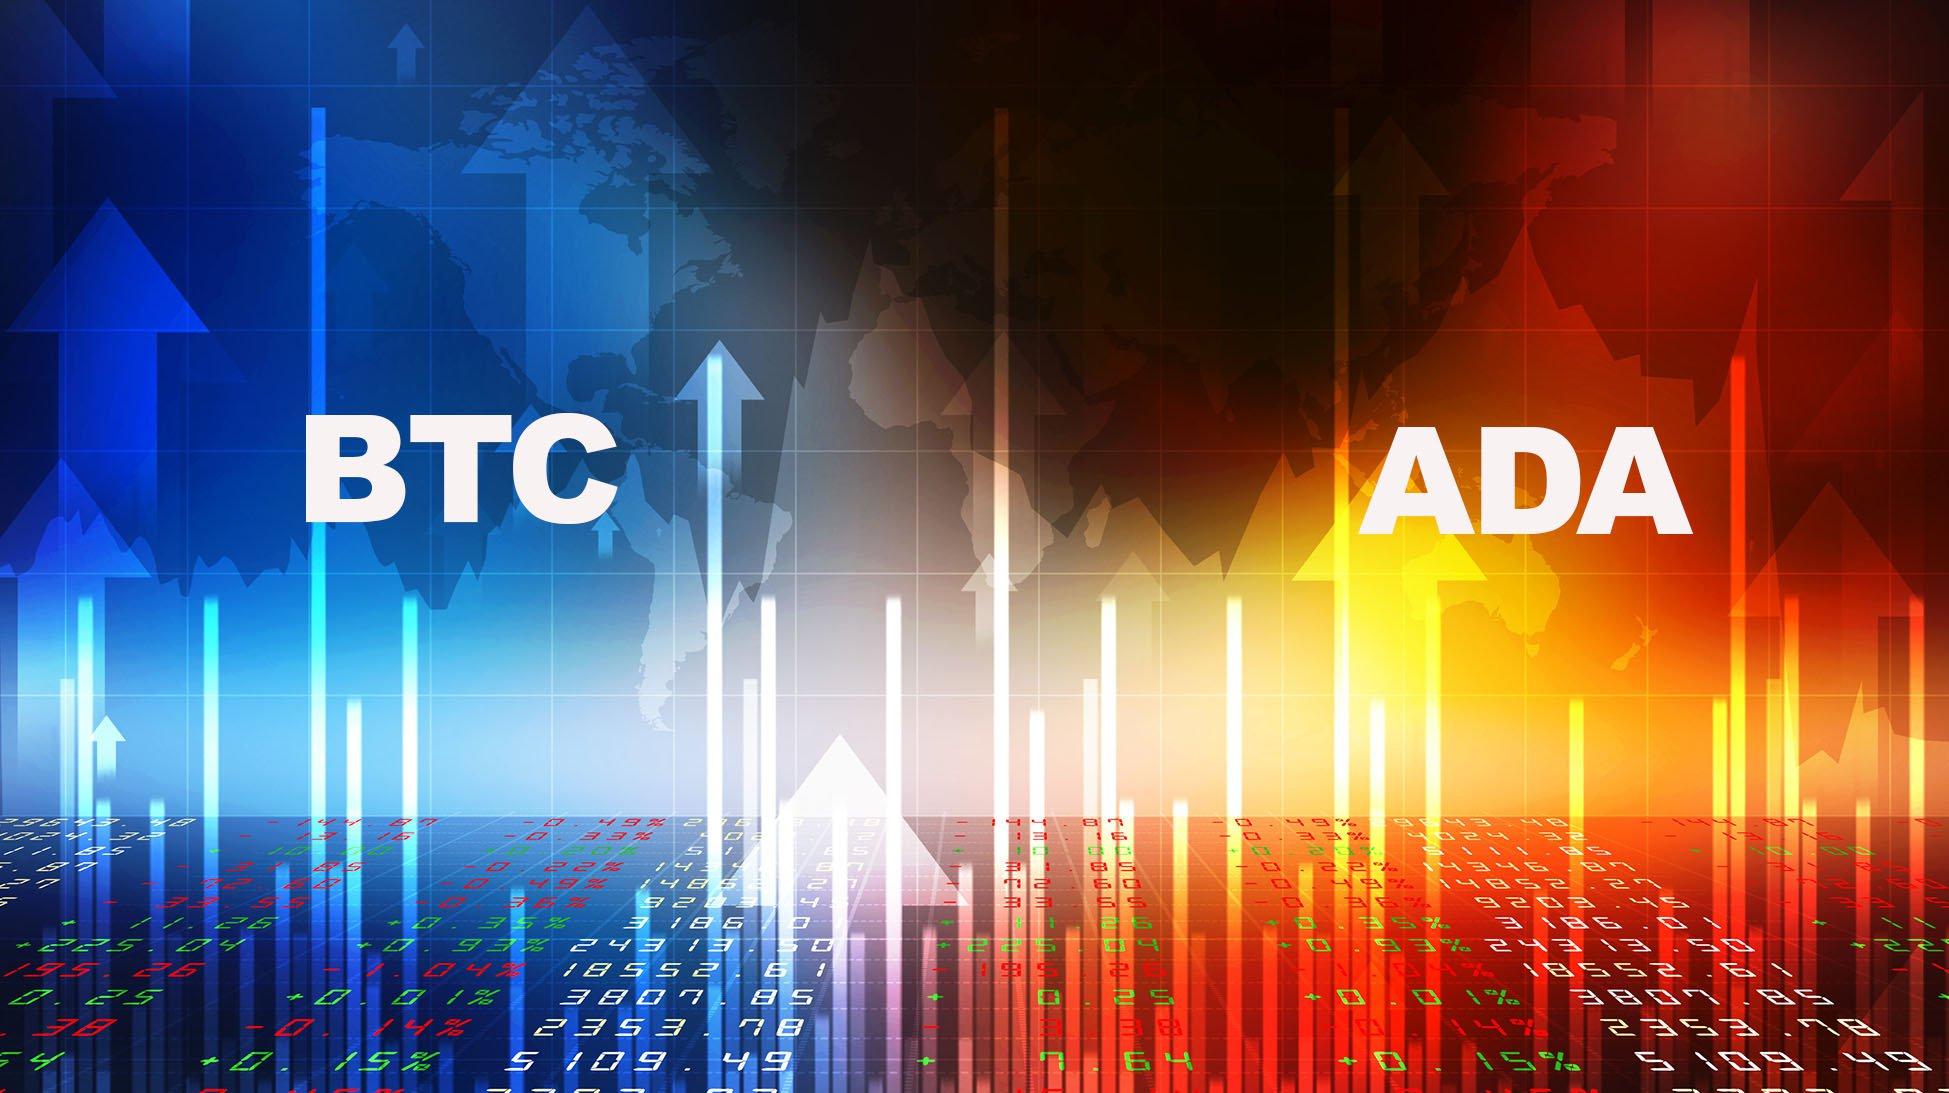 Bitcoin BTC ve Cardano ADA